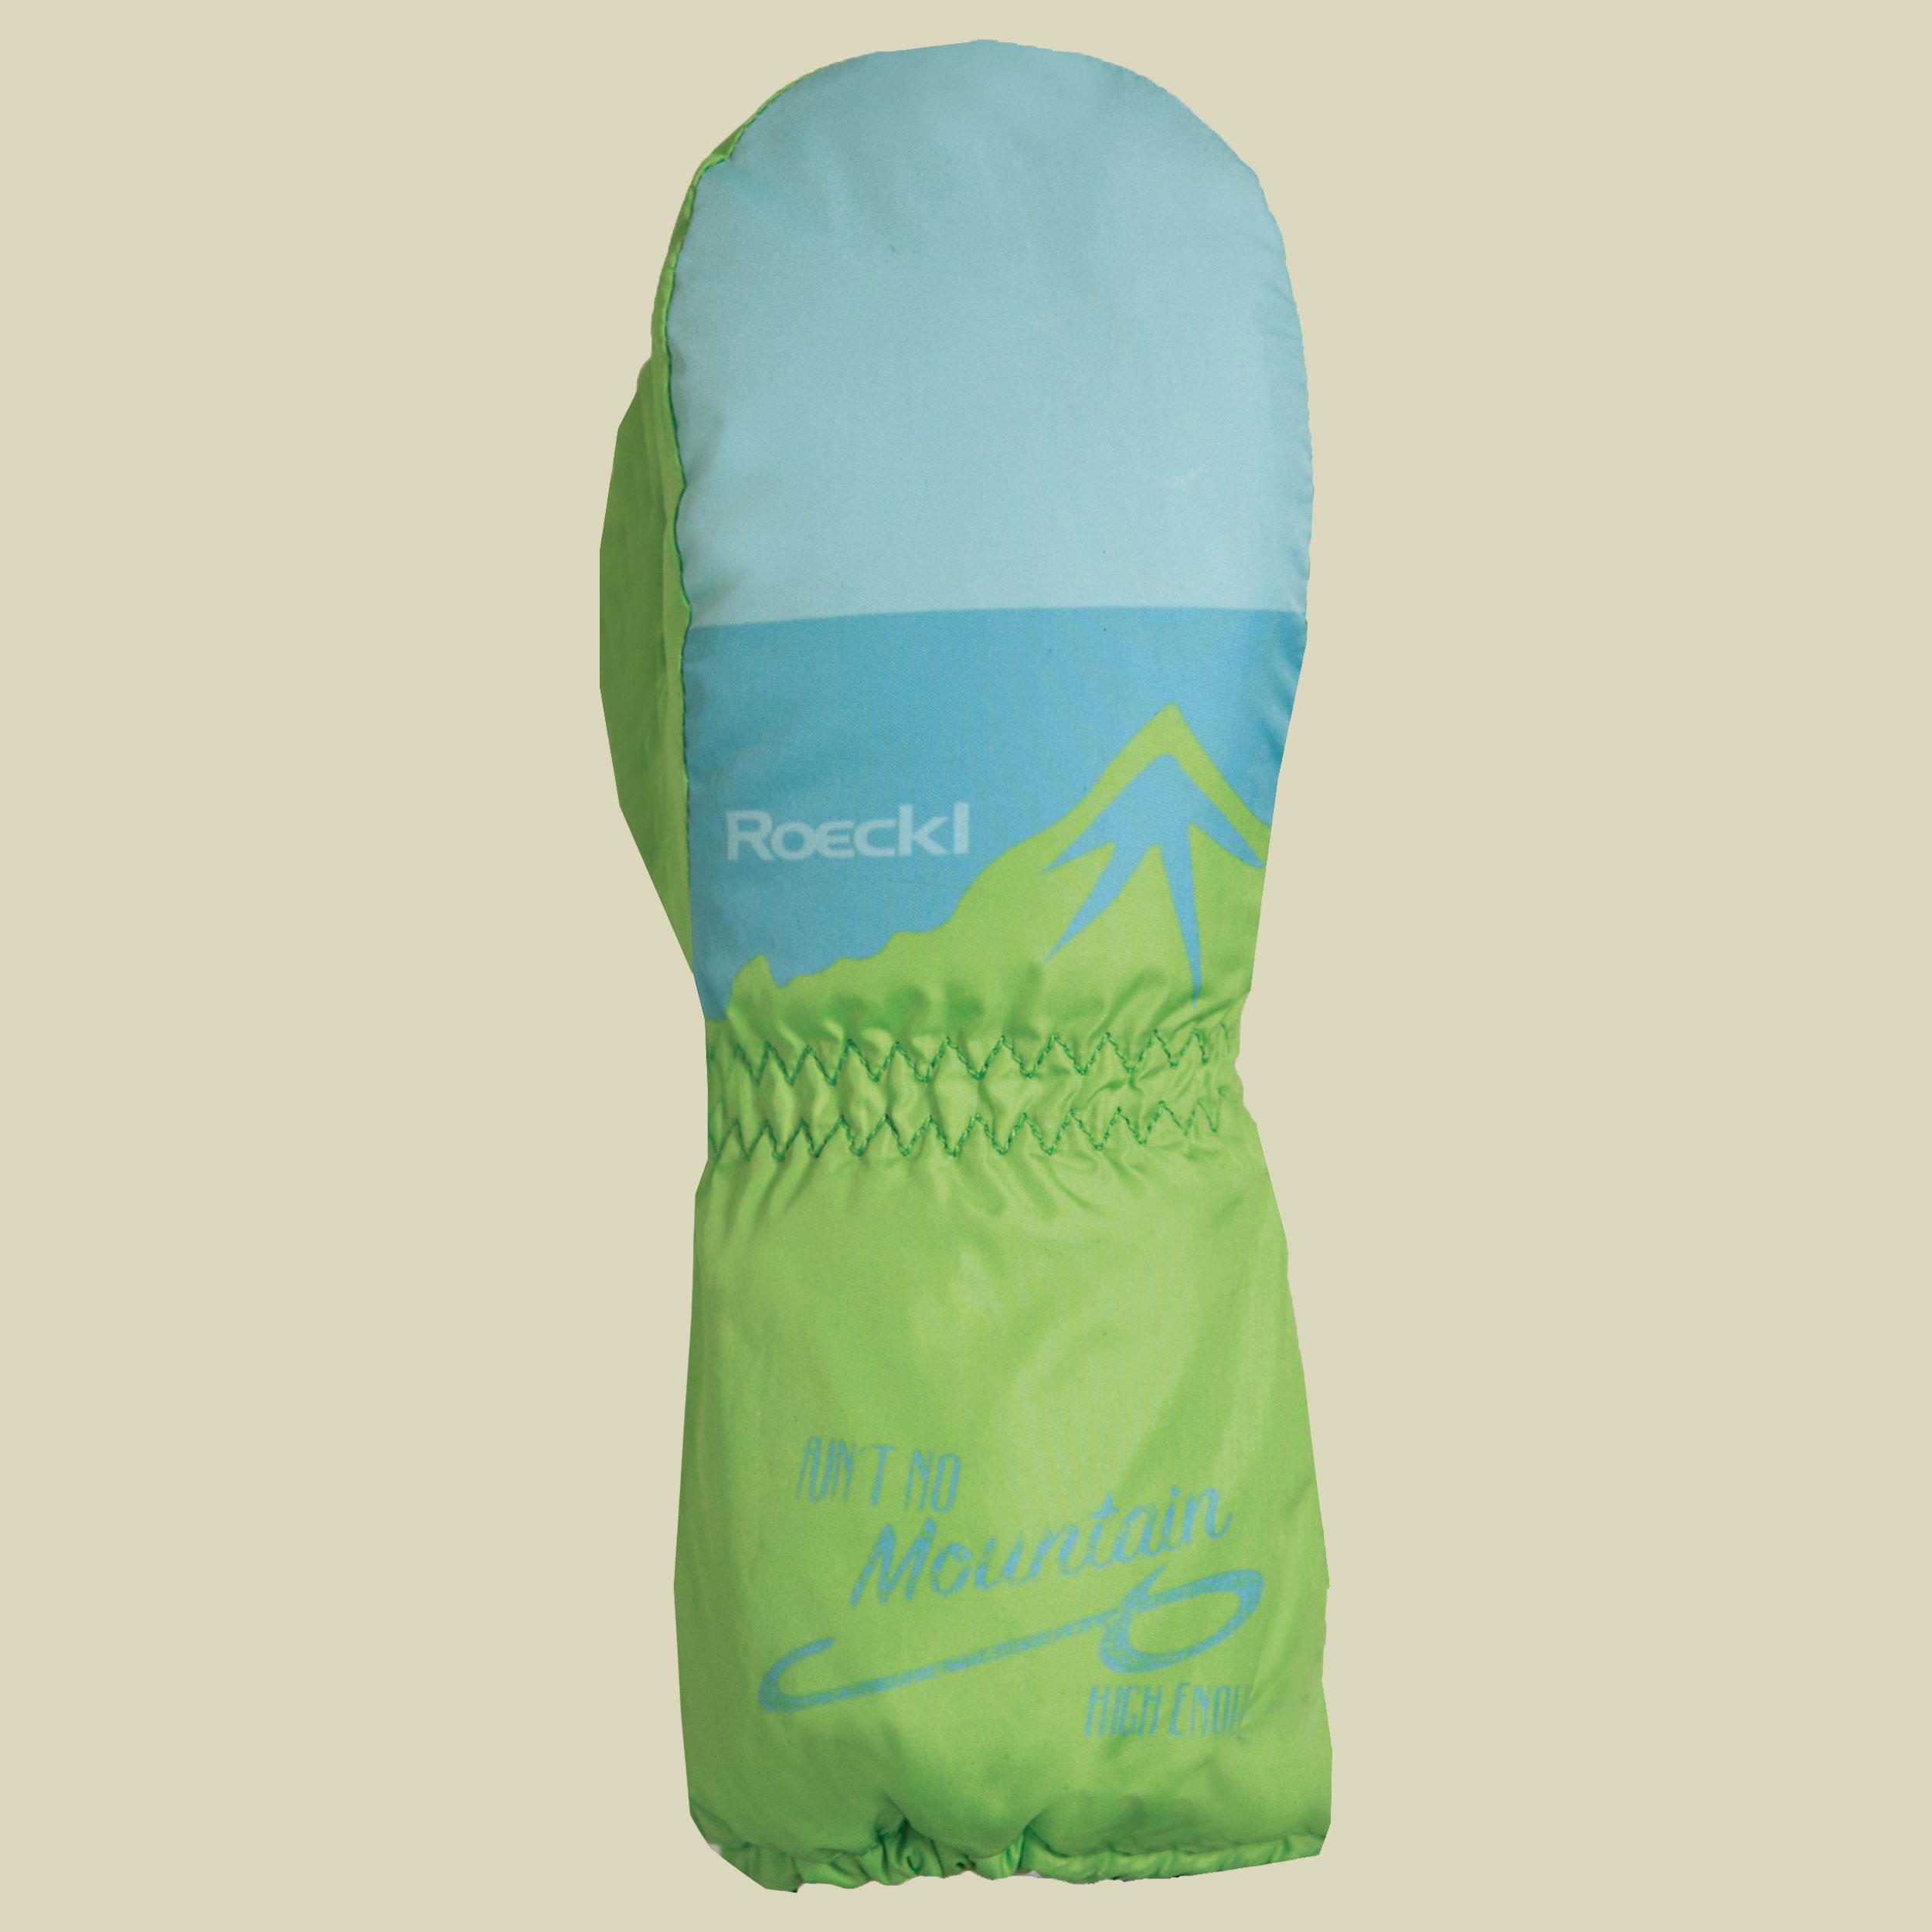 Roeckl Kabru Mitten GTX Unisex Handschuh Handschuhe Camping & Outdoor